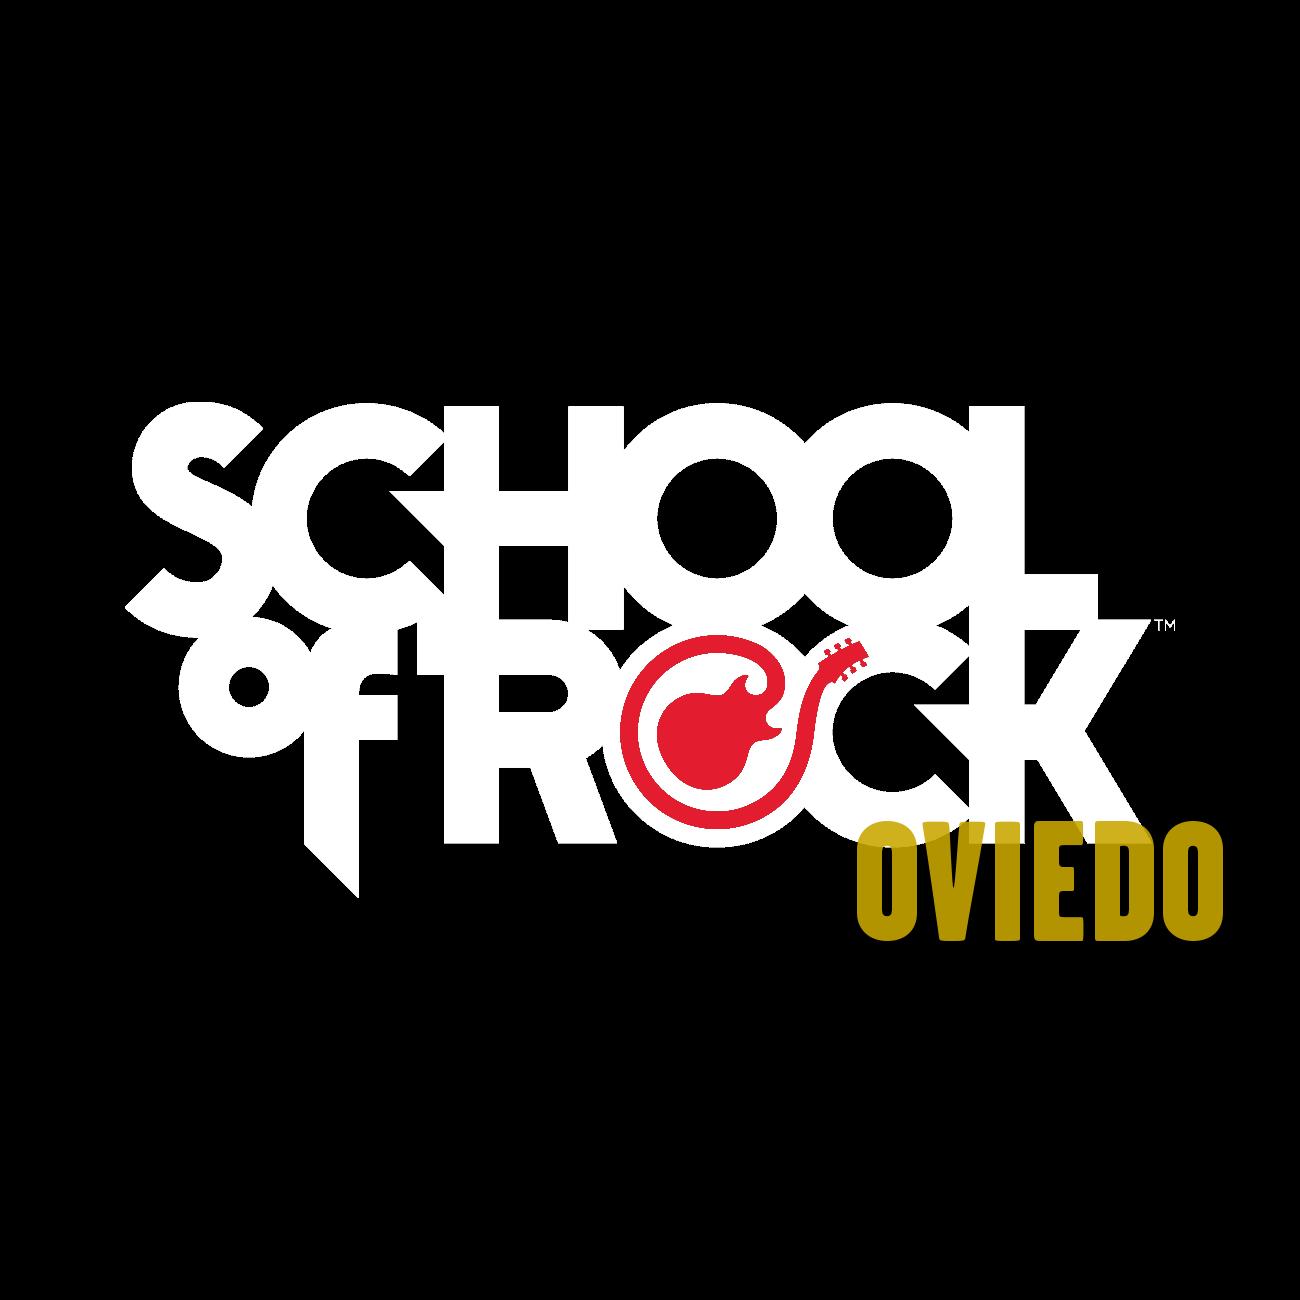 School of Rock Oviedo - Oviedo, FL 32765 - (407)706-3900 | ShowMeLocal.com